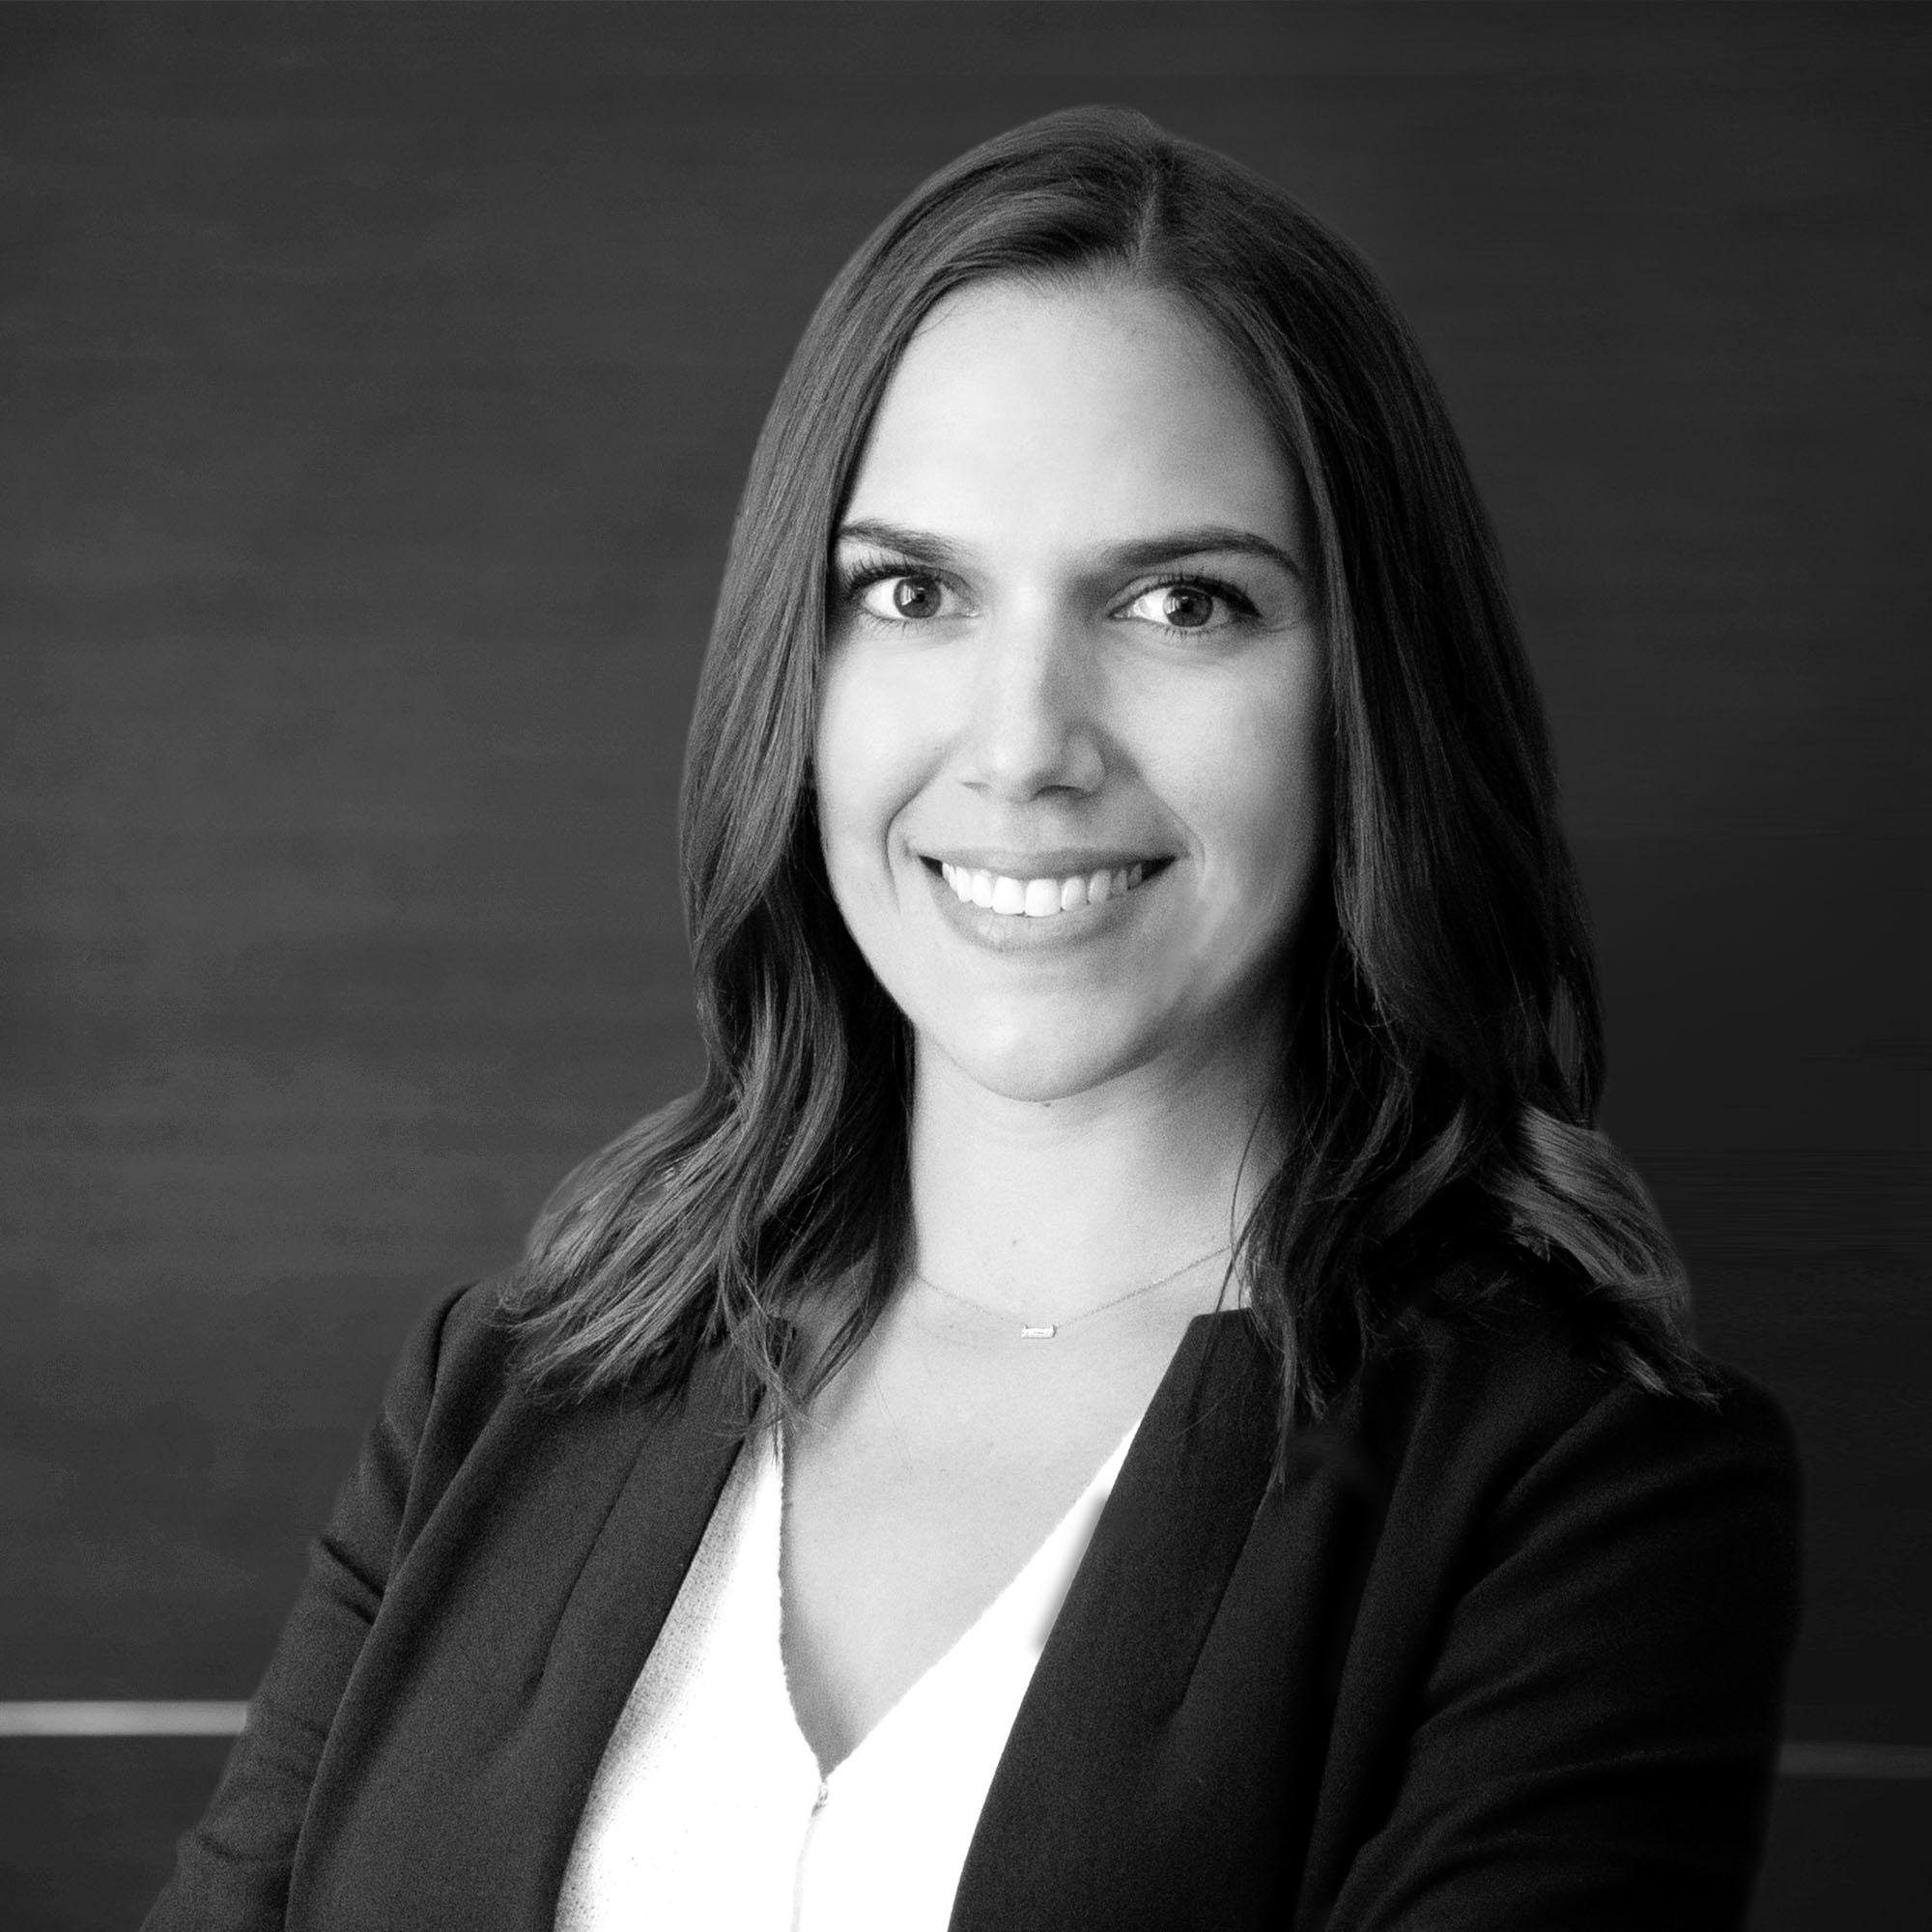 Caroline Khalili-Lazarjani - Senior Director of Strategic Marketing and Communications